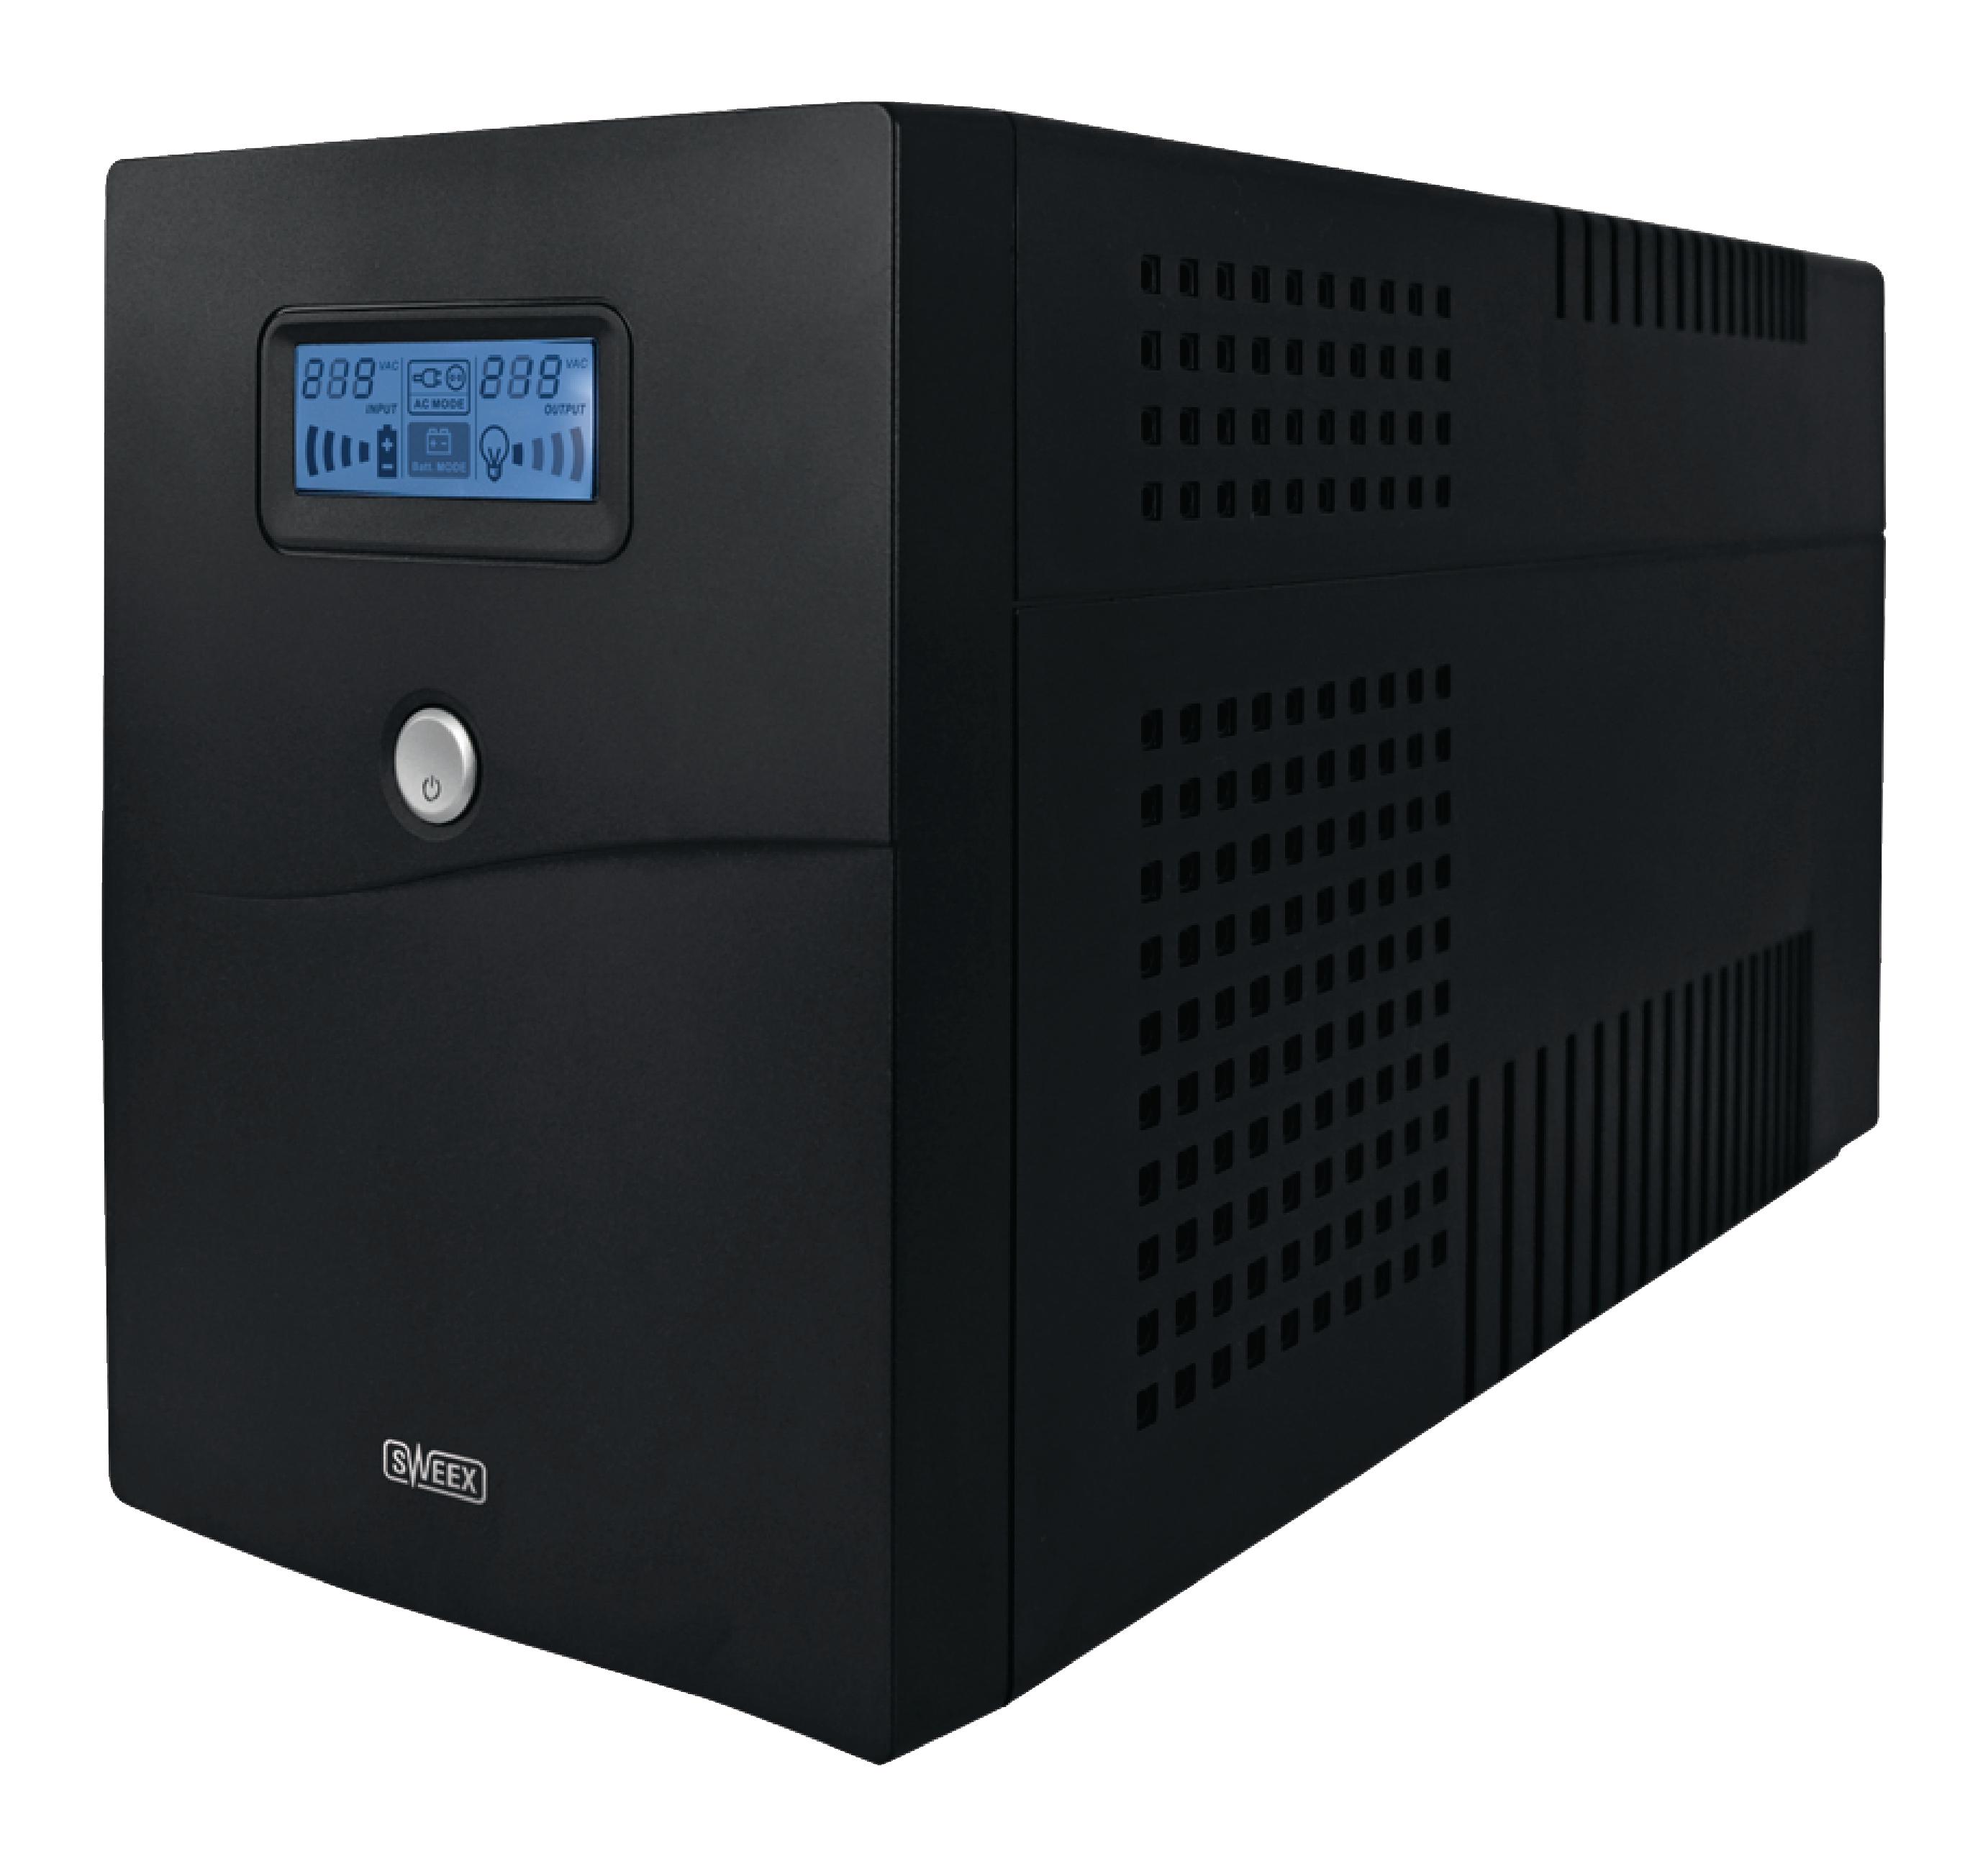 Sweex záložní zdroj UPS 1500 VA 900 W, PP220